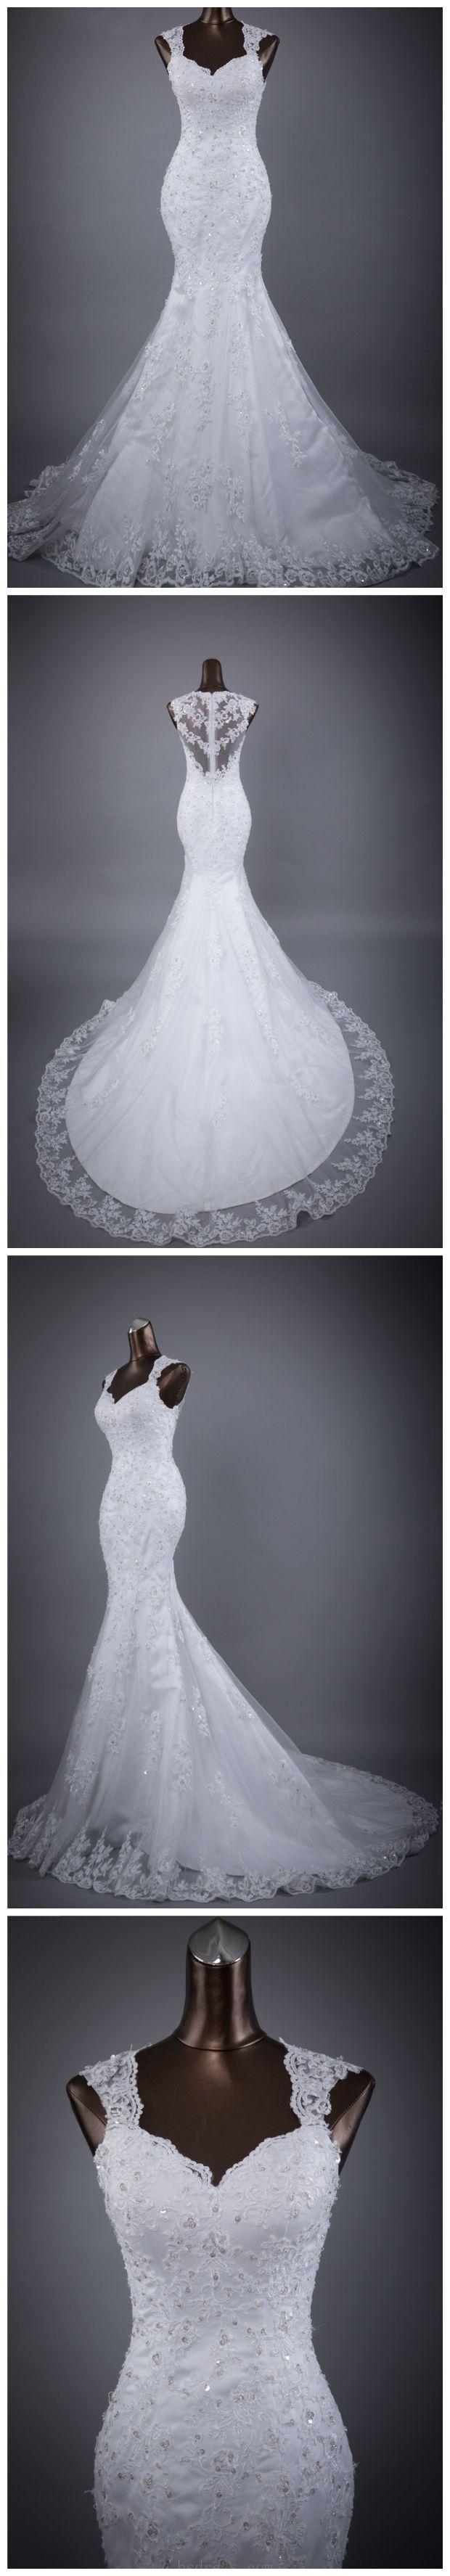 Wedding decorations beach december 2018  best Wedding Dresses  images on Pinterest